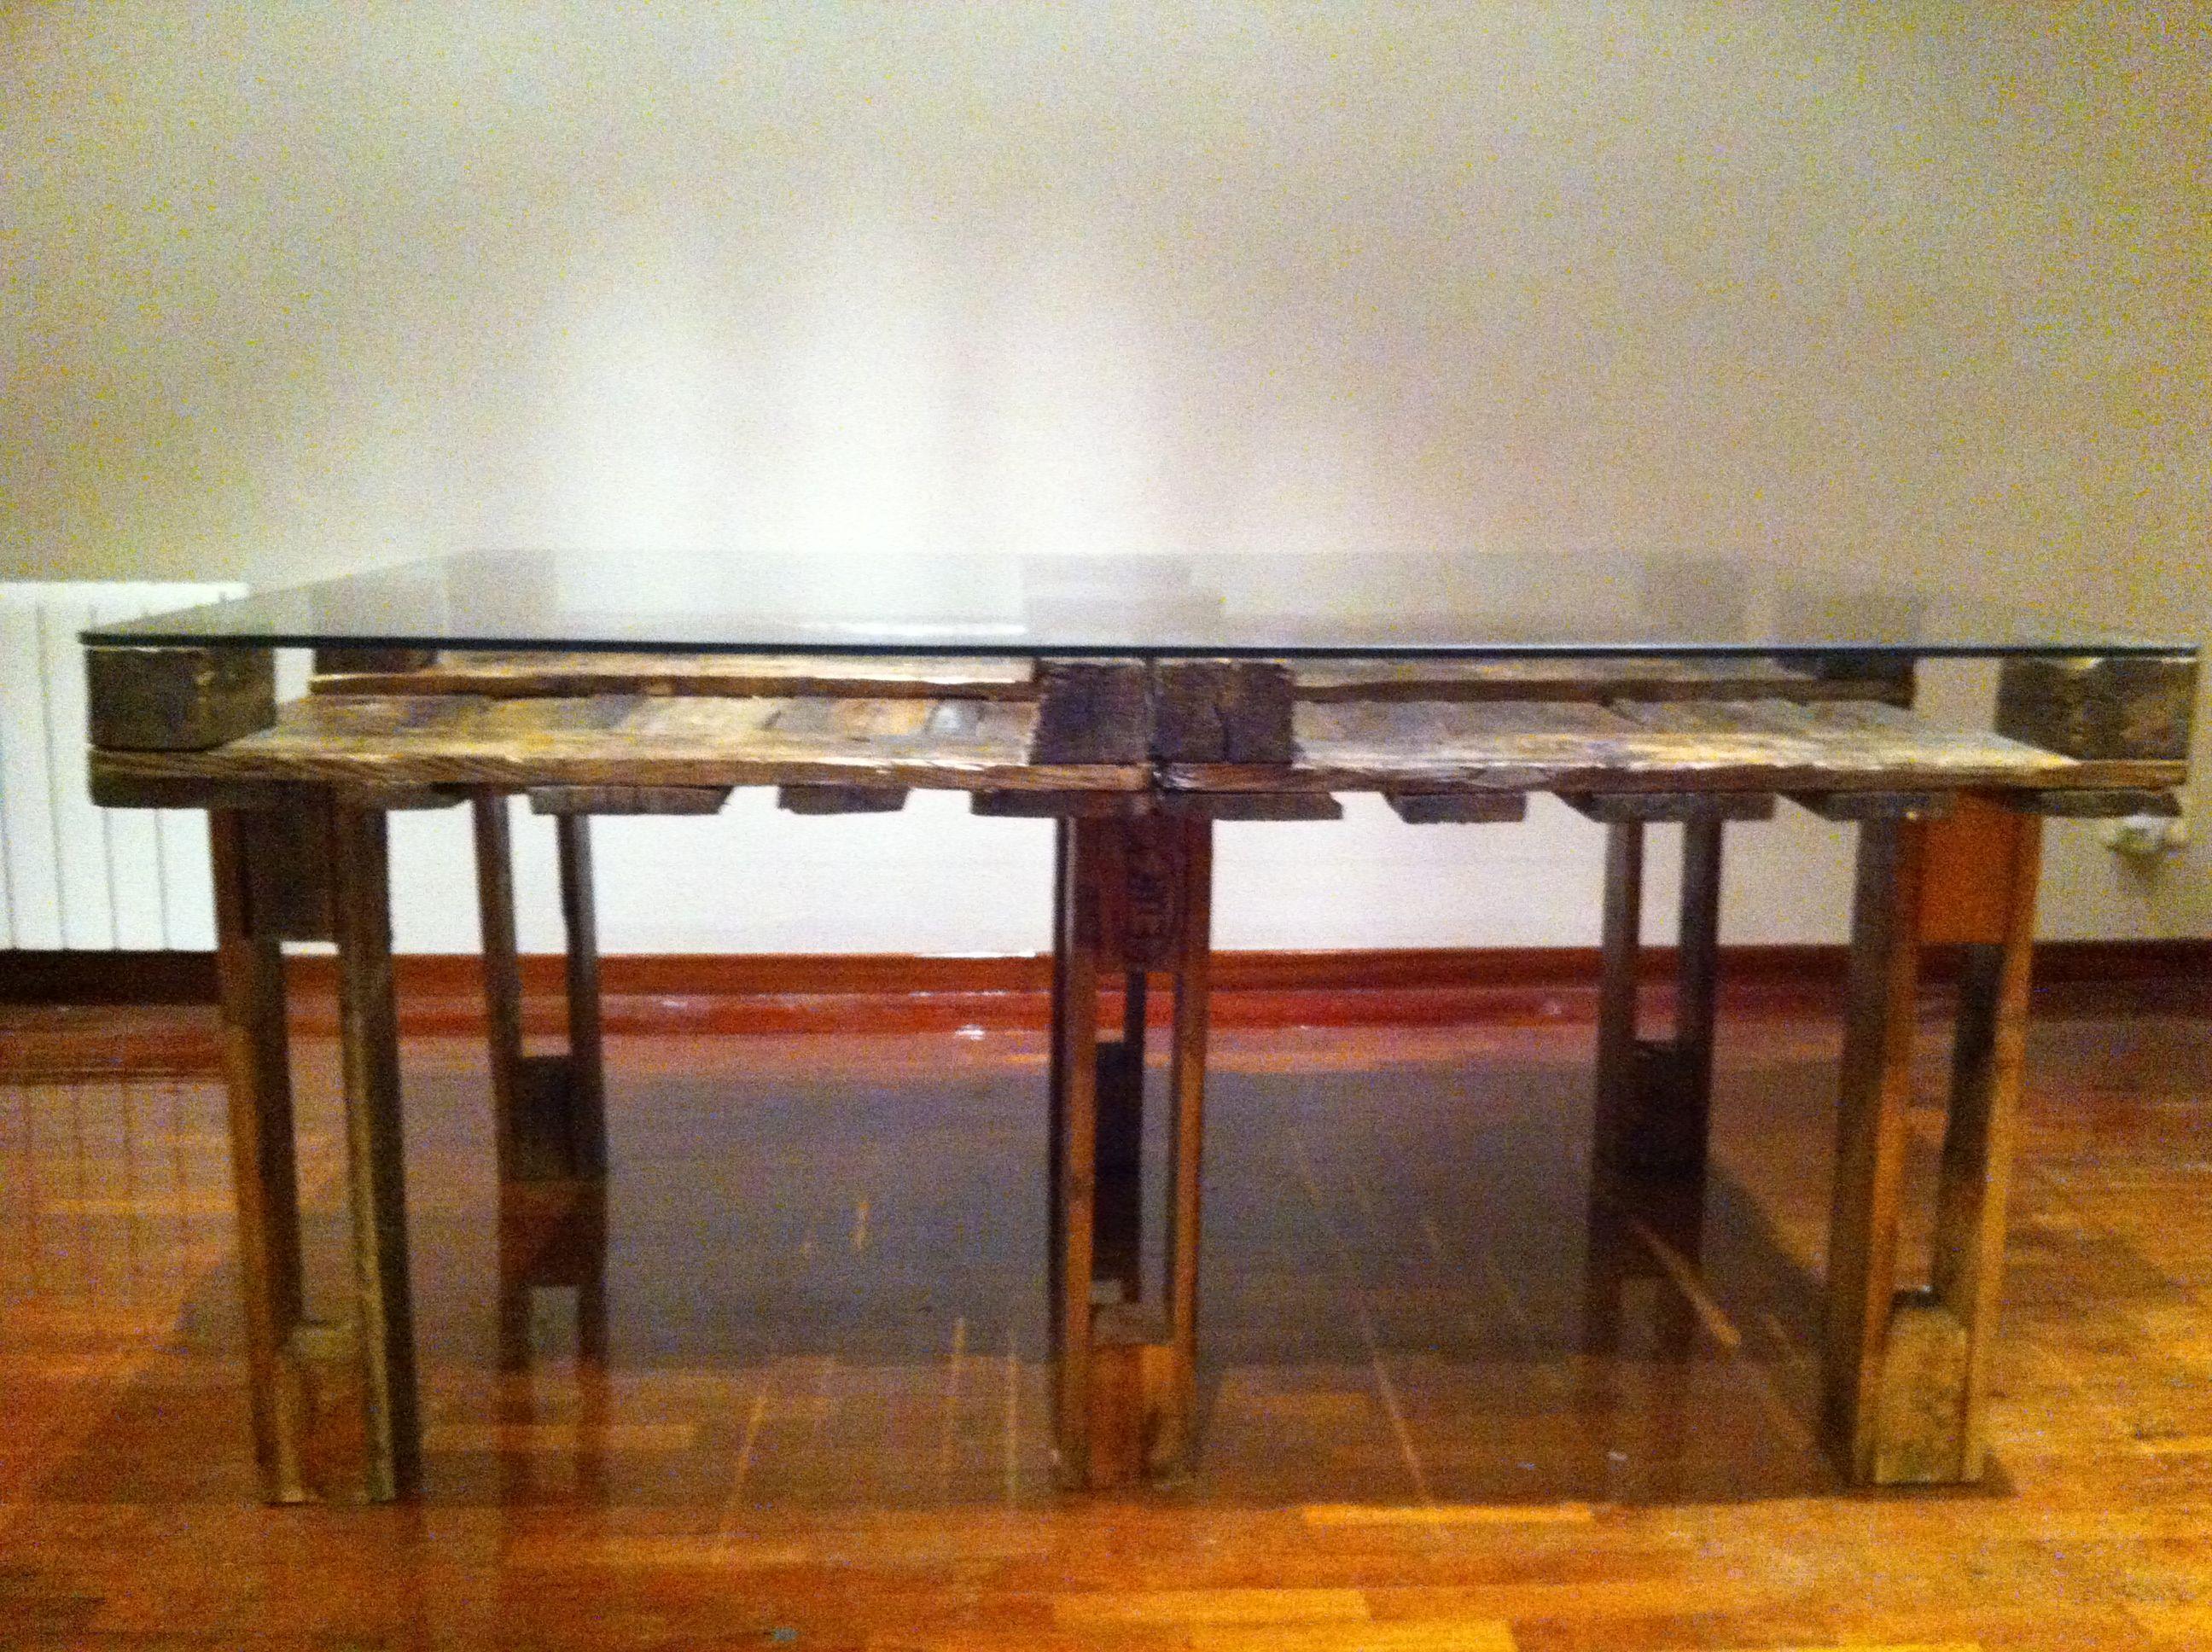 Mesa de comedor con palets reciclados. 120x160 | Idees | Pinterest ...